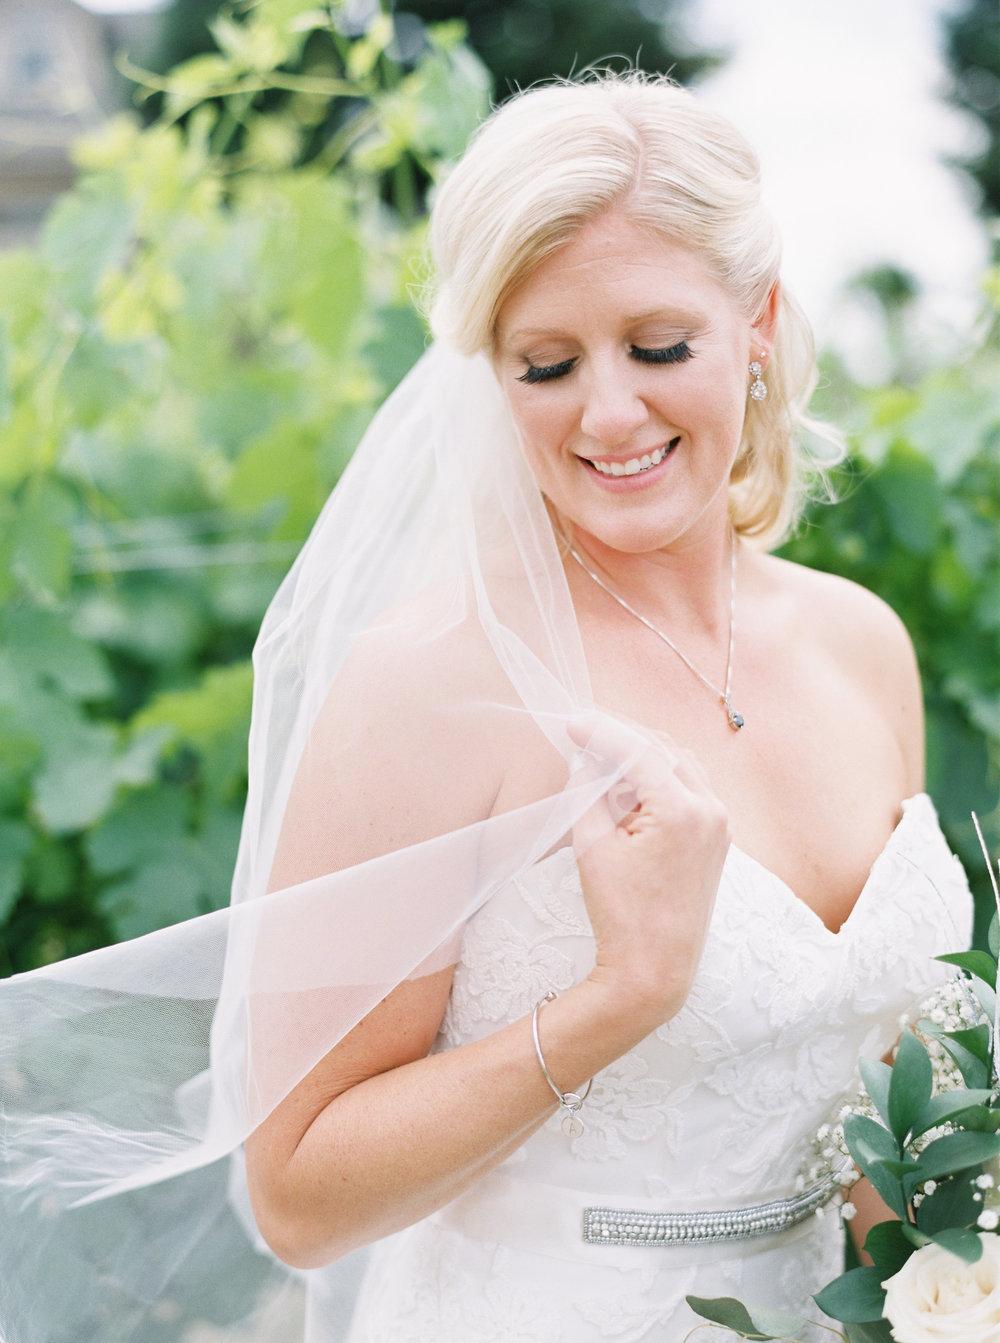 wolfe-heights-event-center-wedding-sacramento-california-wedding-62.jpg